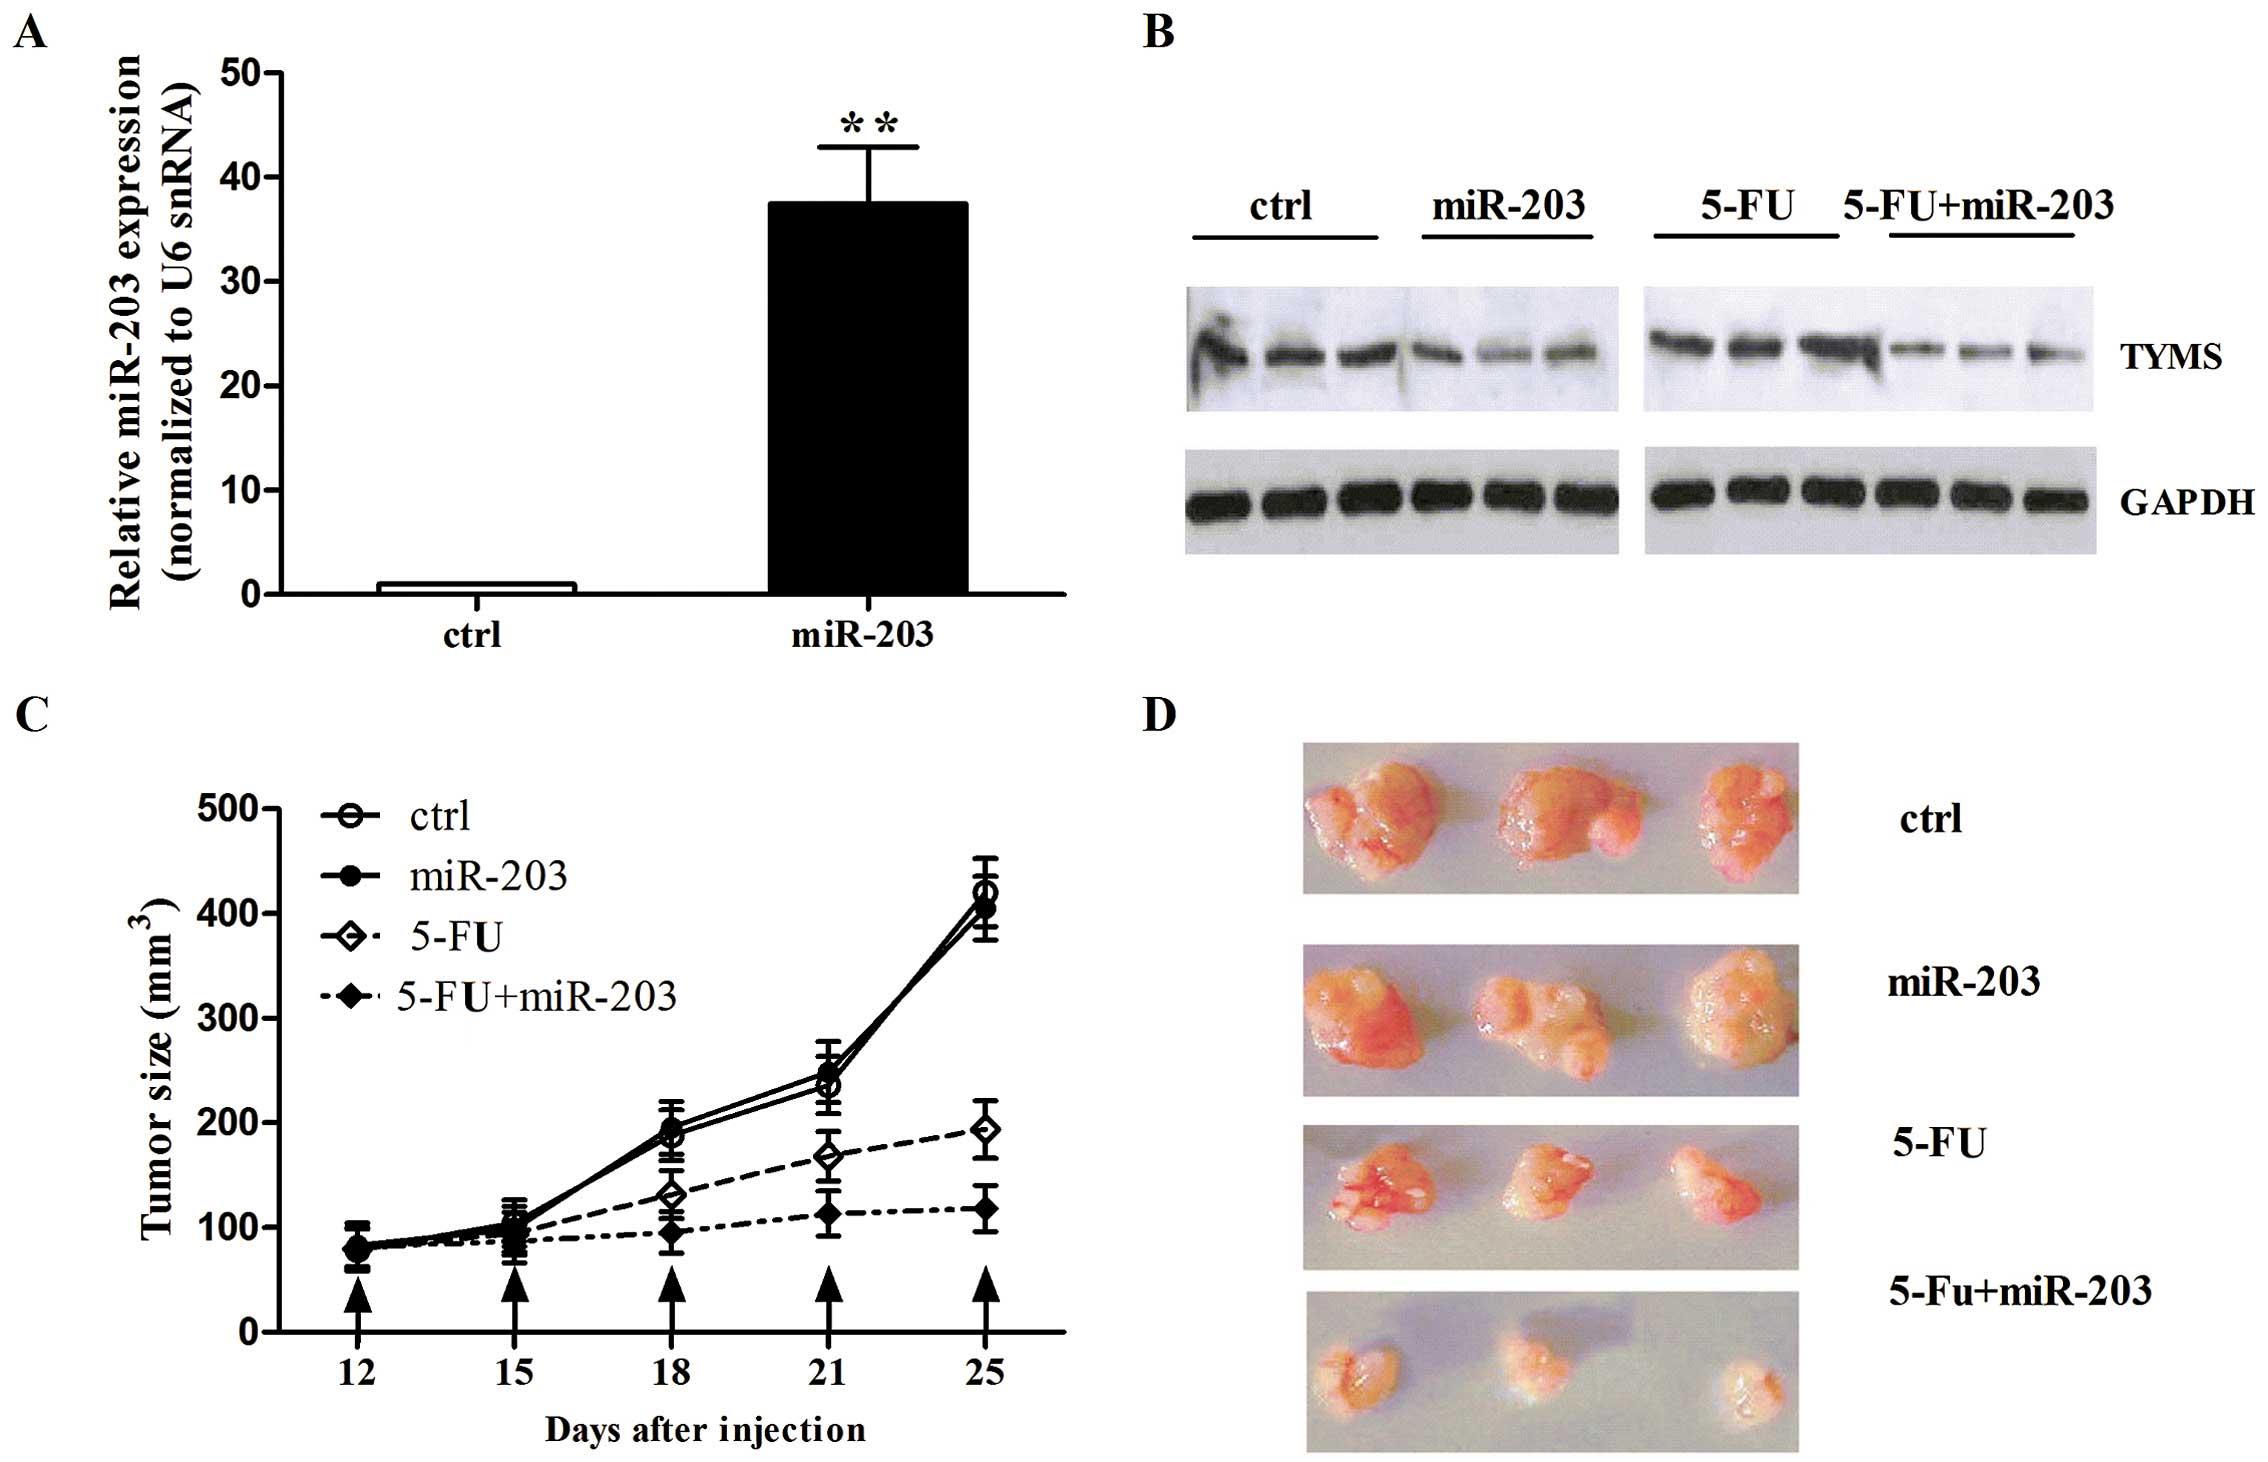 Colorectal cancer 5- fu